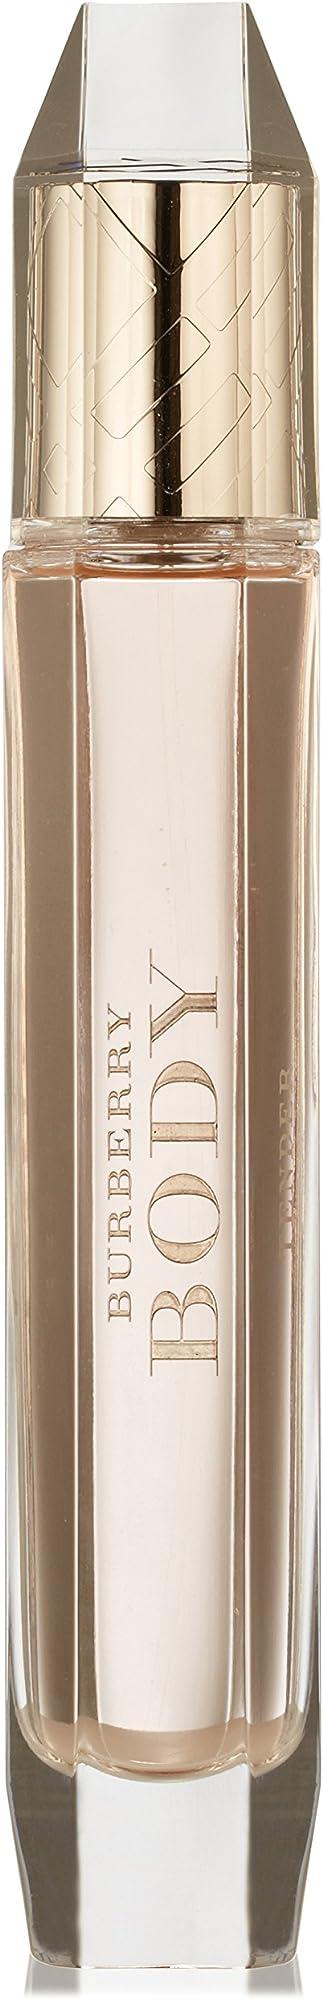 Burberry body tender, eau de toilette per donna, 85 ml, spray BBTTS28